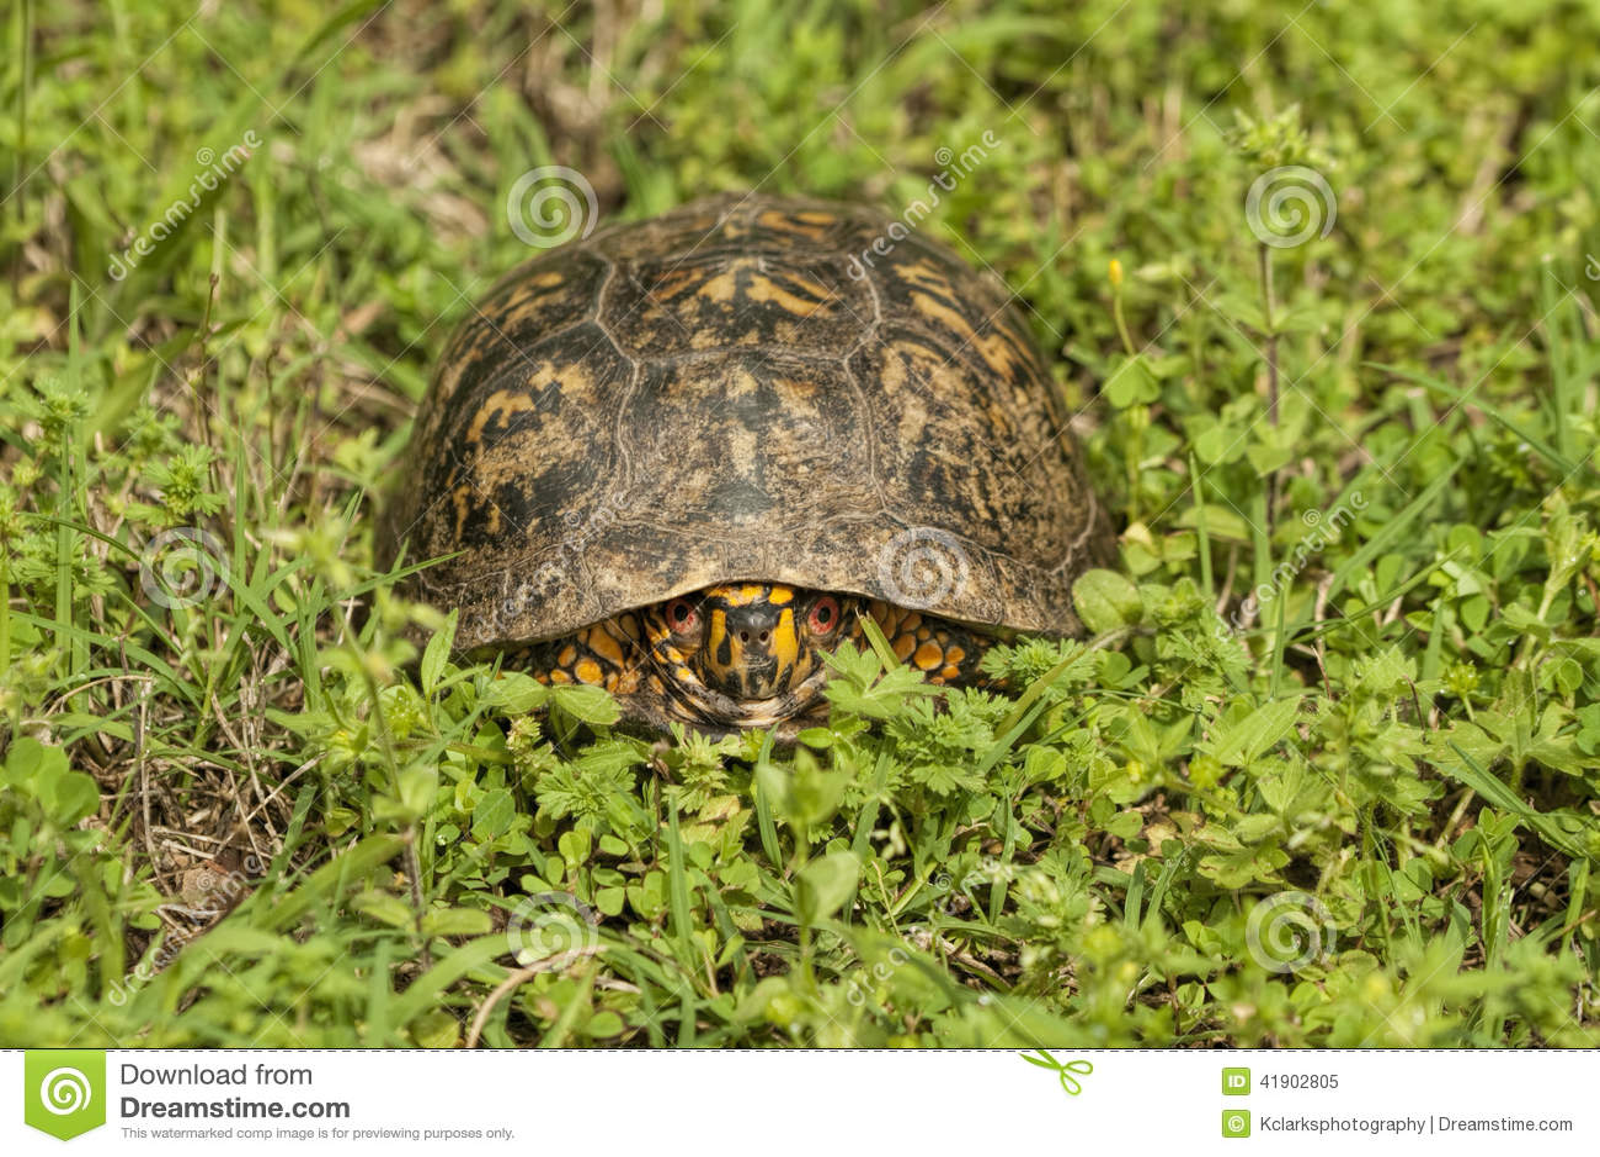 O vermelho masculino Eyed a tartaruga de caixa - Terrapene carolina